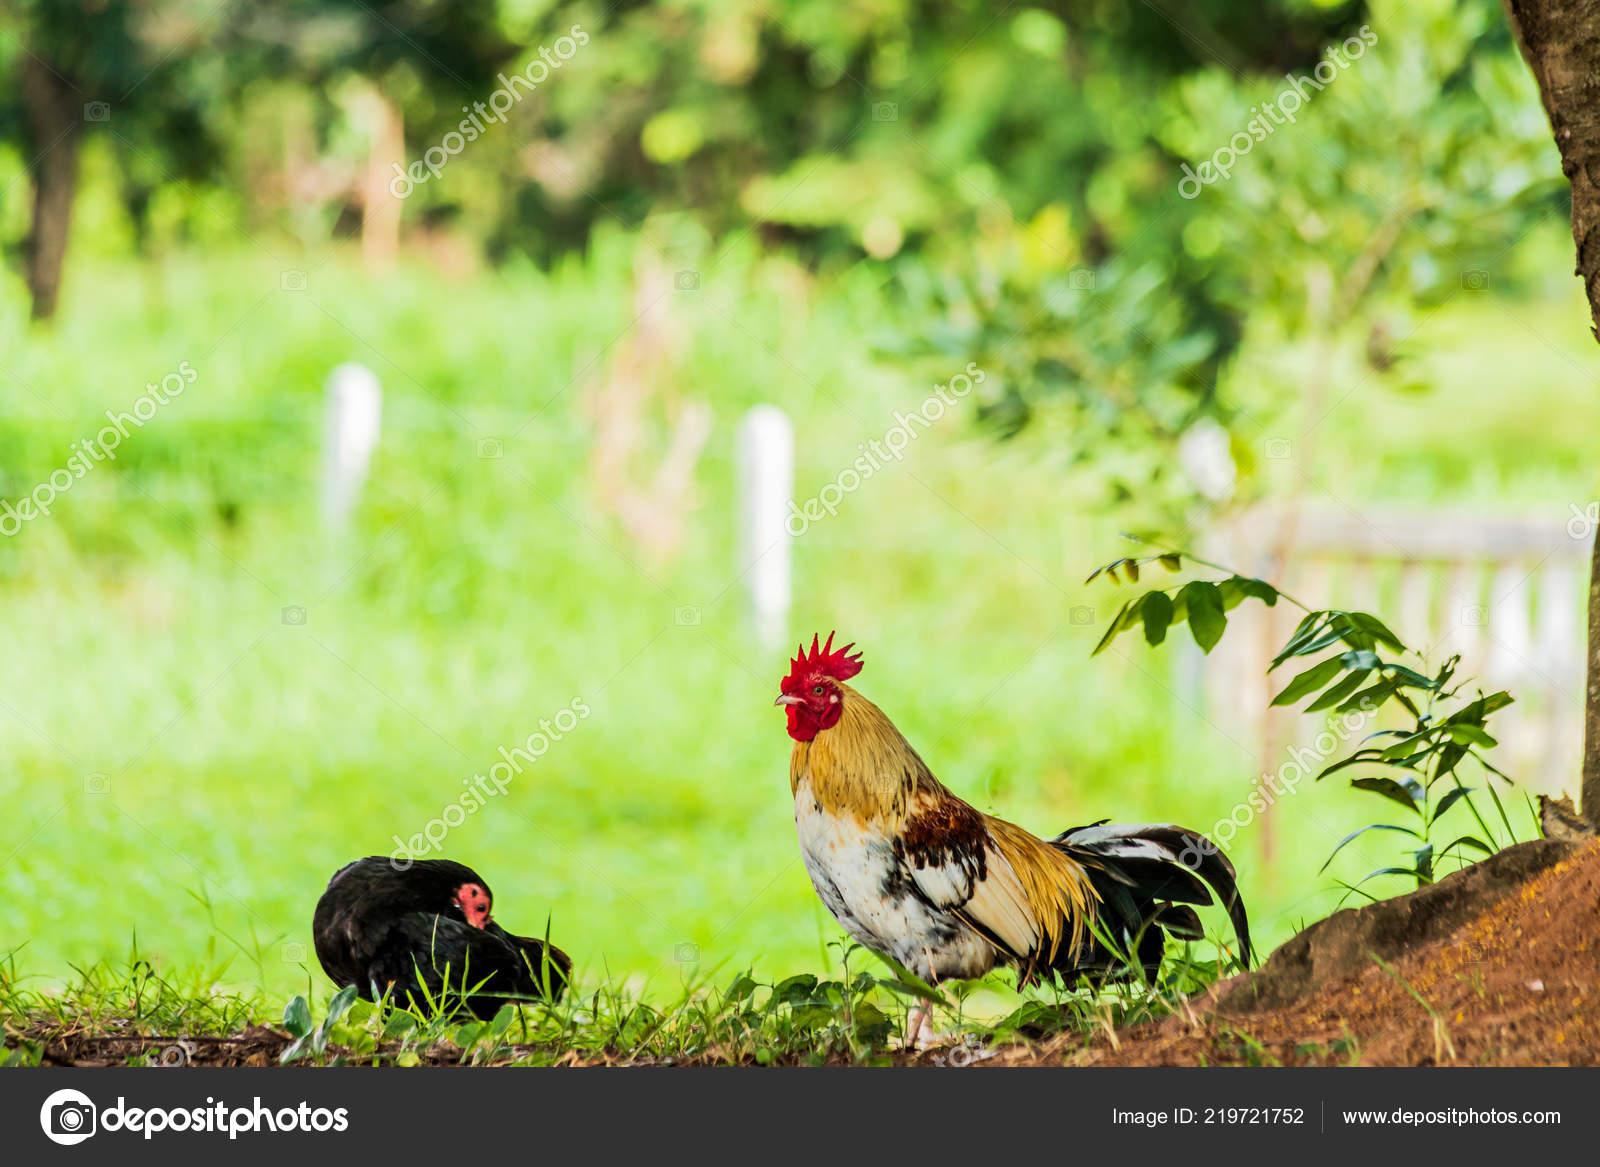 Male Female Chickens Shade — Stock Photo © sanpom #219721752